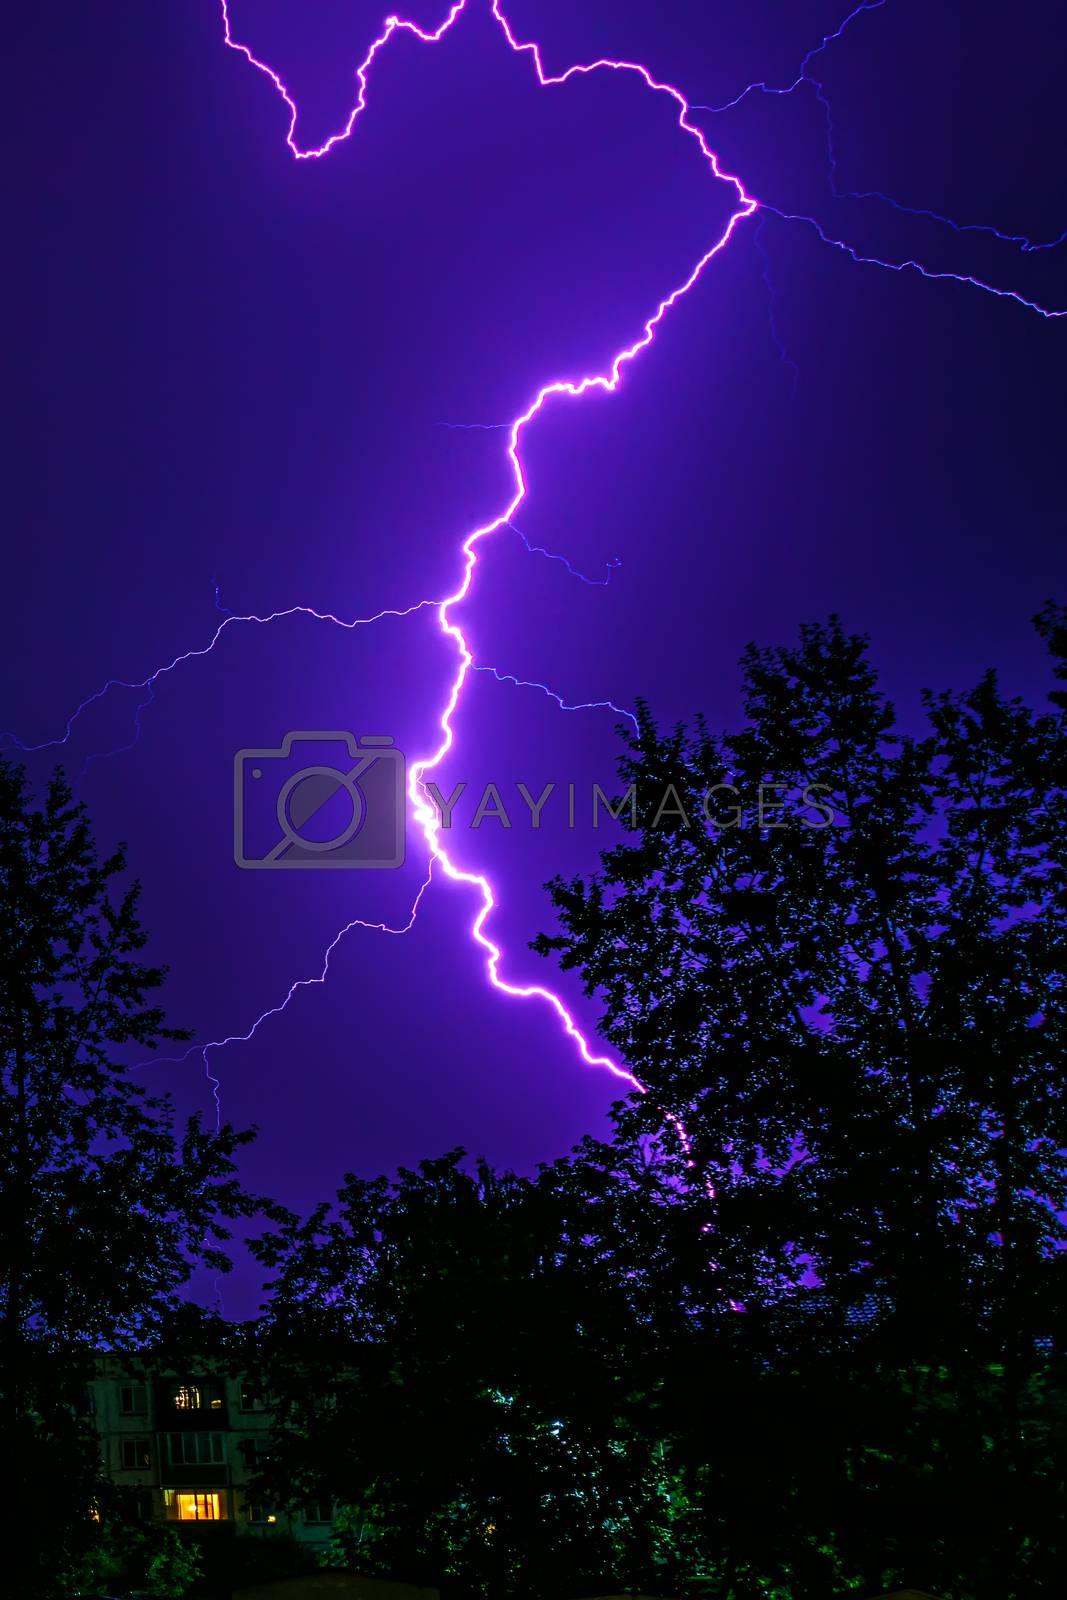 lightning during a thunderstorm in the night by VladimirZubkov